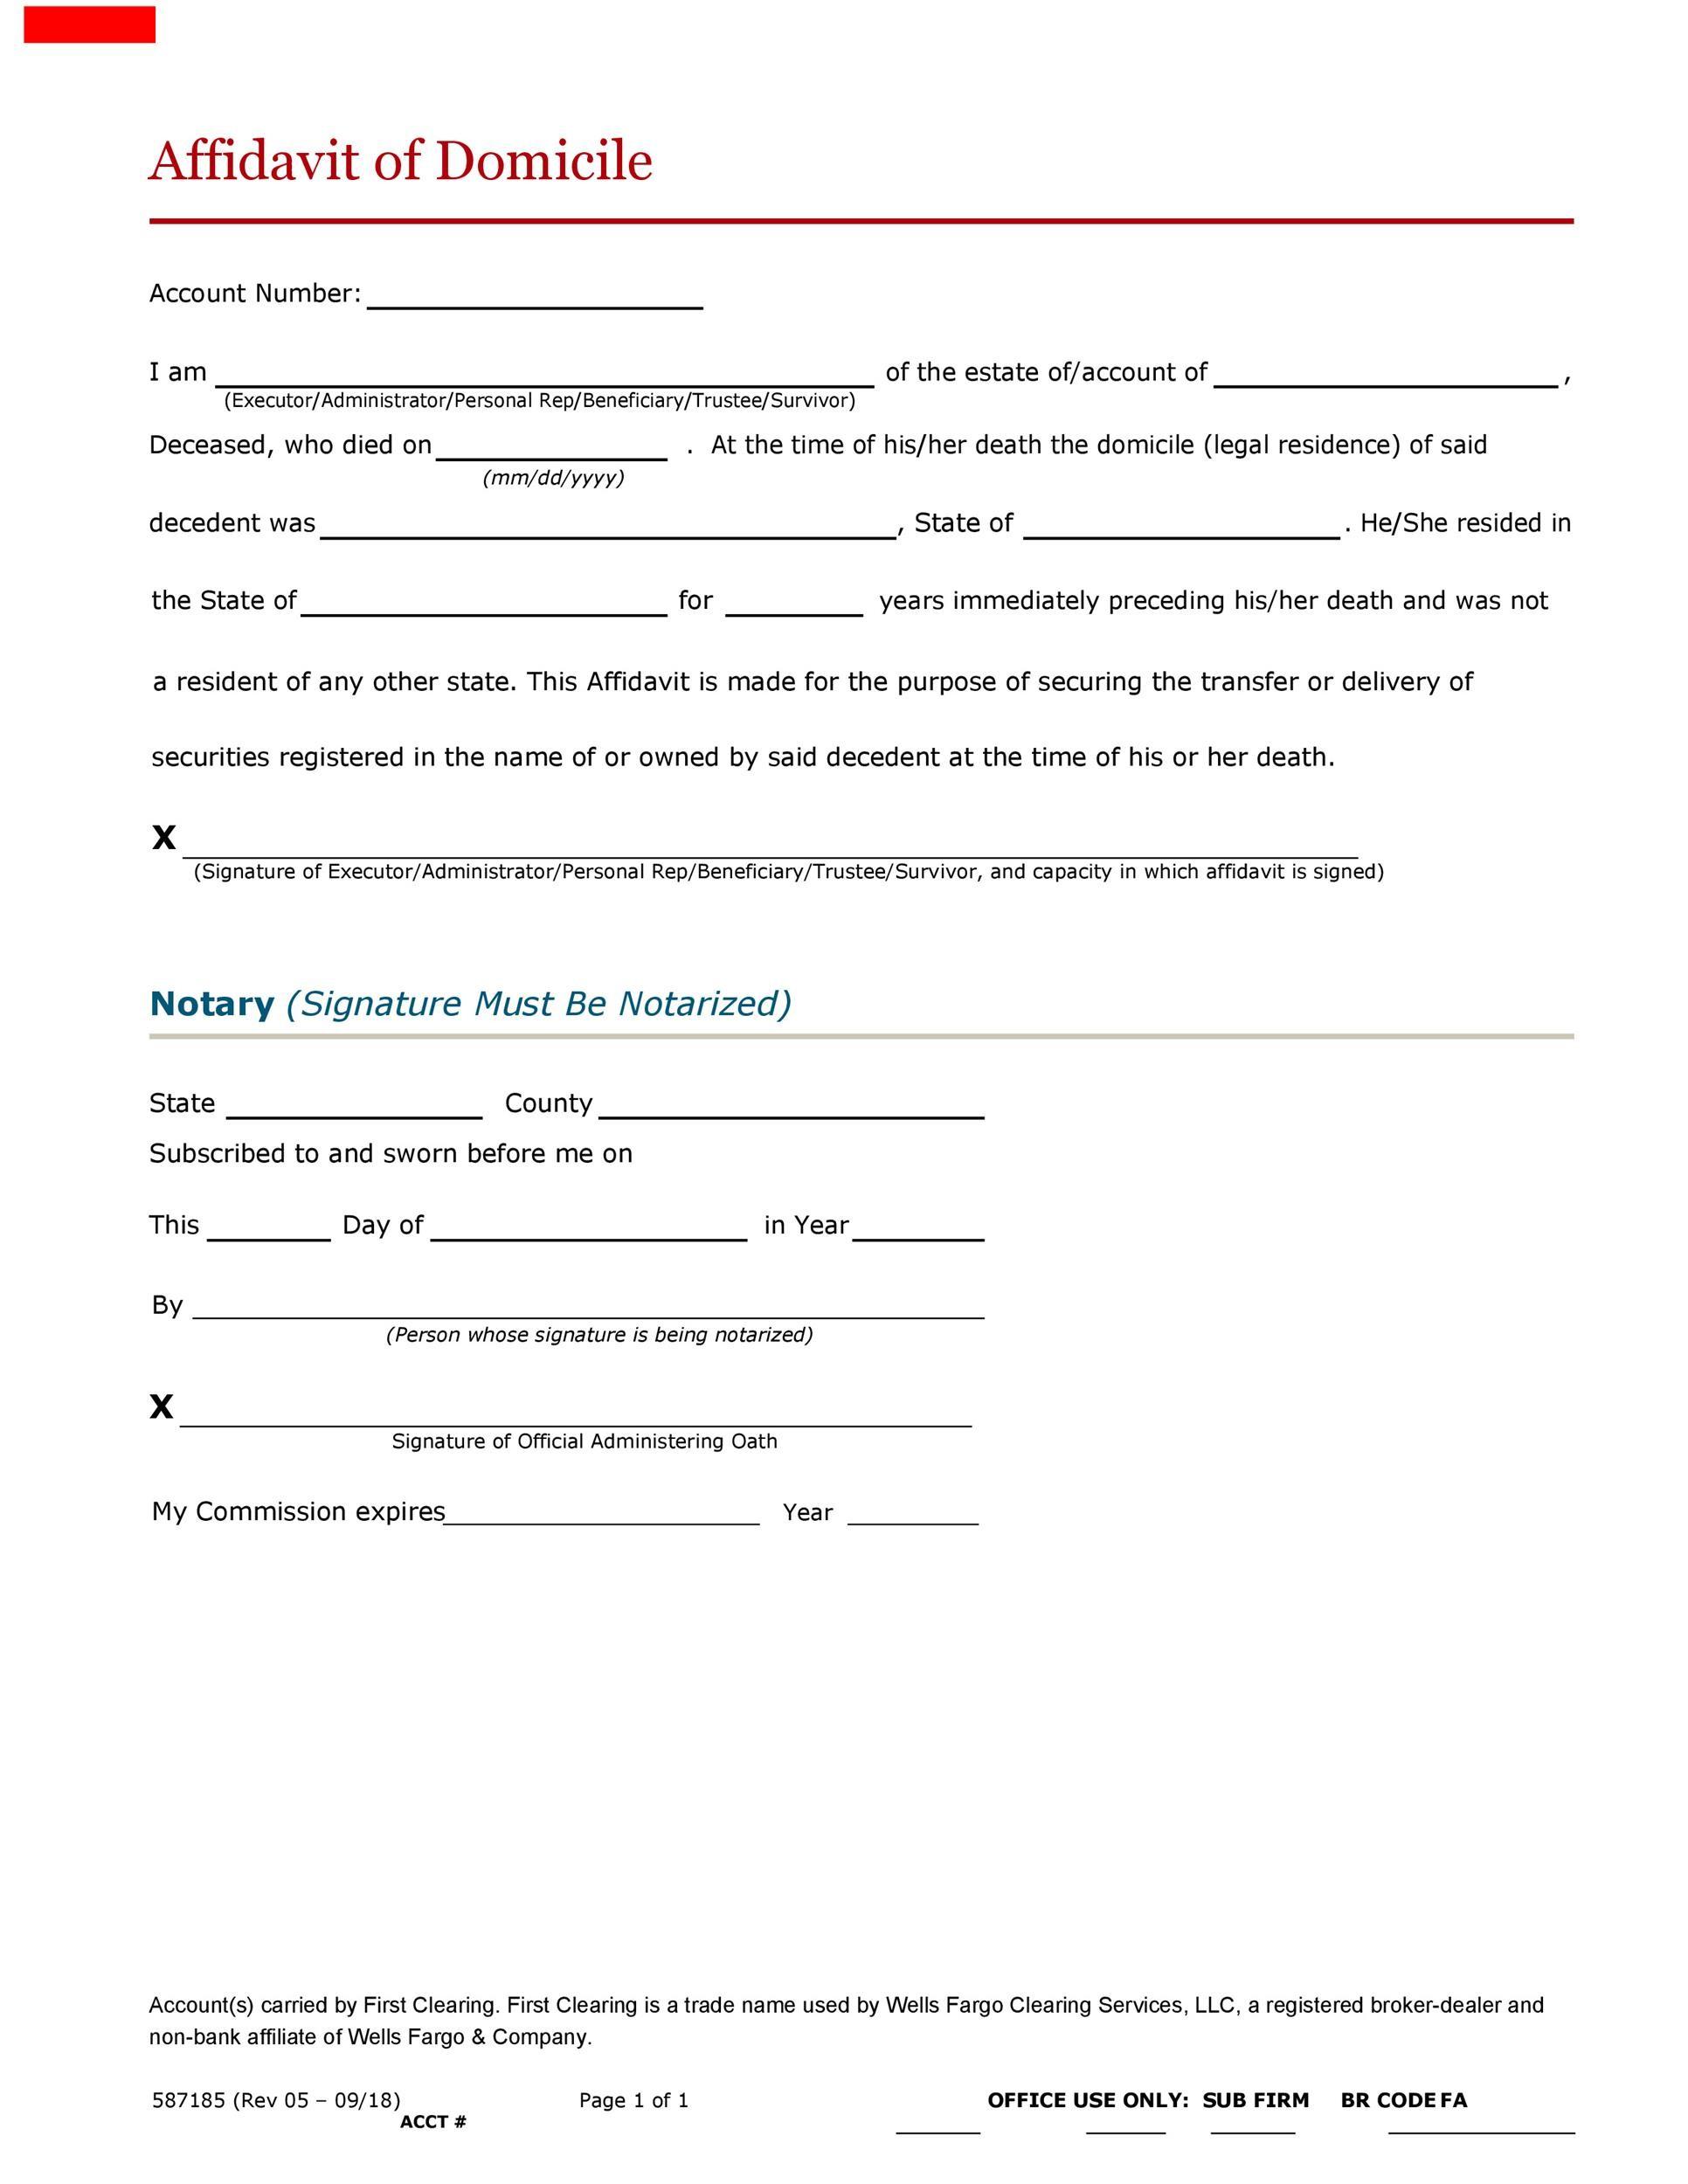 Free affidavit of domicile 10